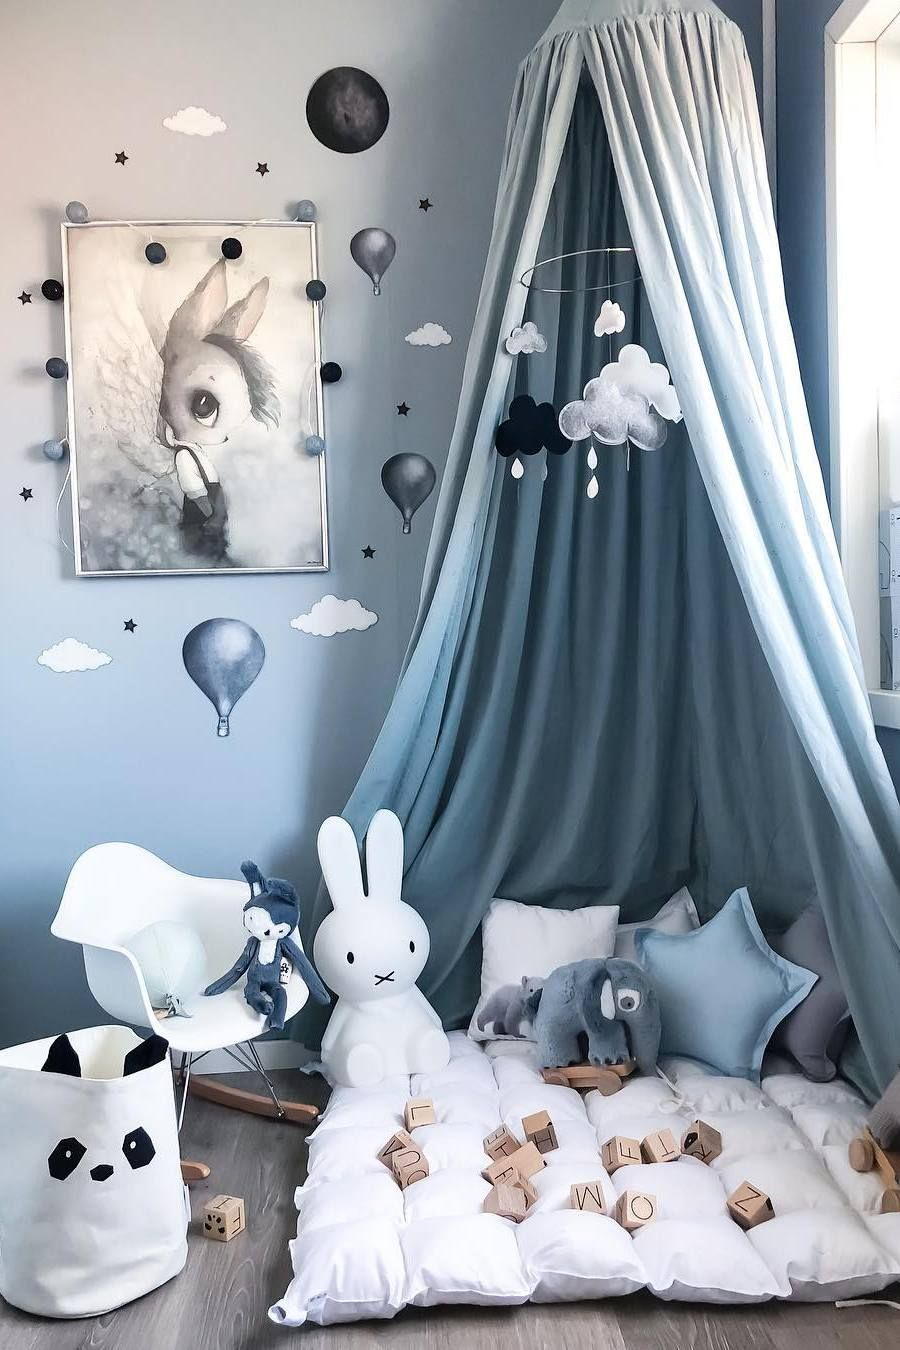 Star Pillowblackwhite Greyblueyellow Star Cushion Etsy Toddler Room Decor Scandinavian Kids Rooms Baby Room Decor